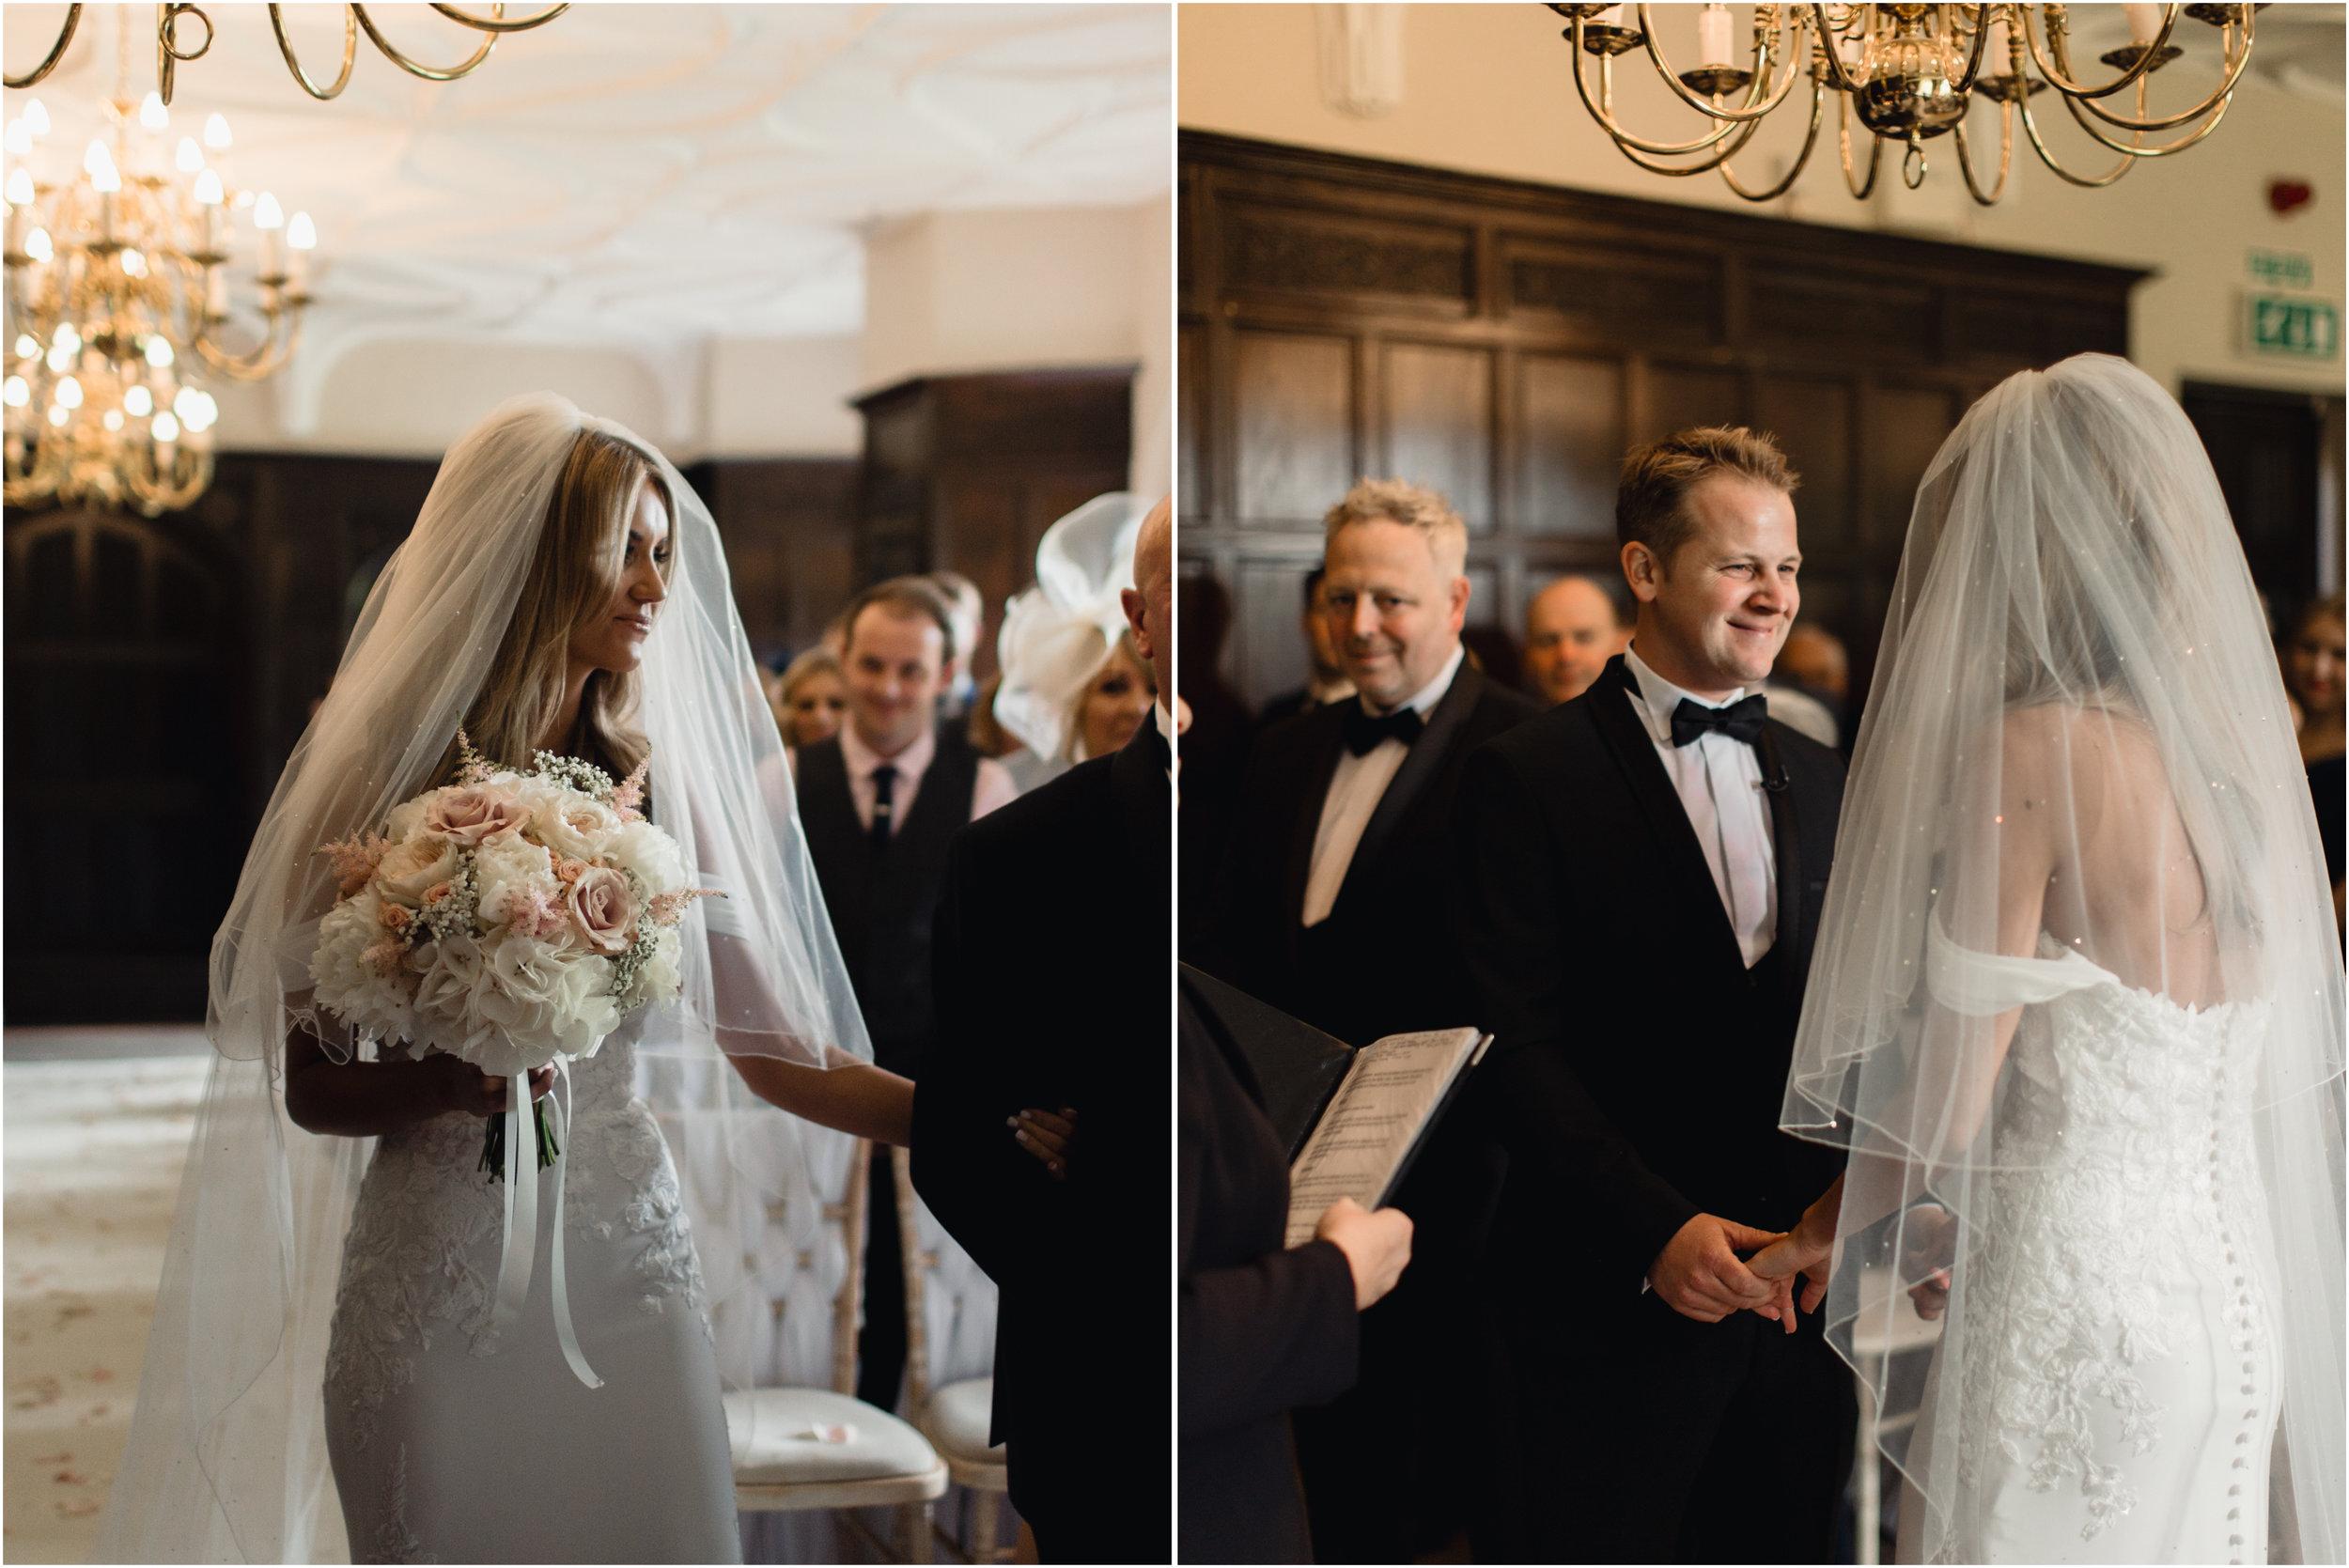 Rebecca Searle Wedding Photography Surrey London Luxury 39.jpg